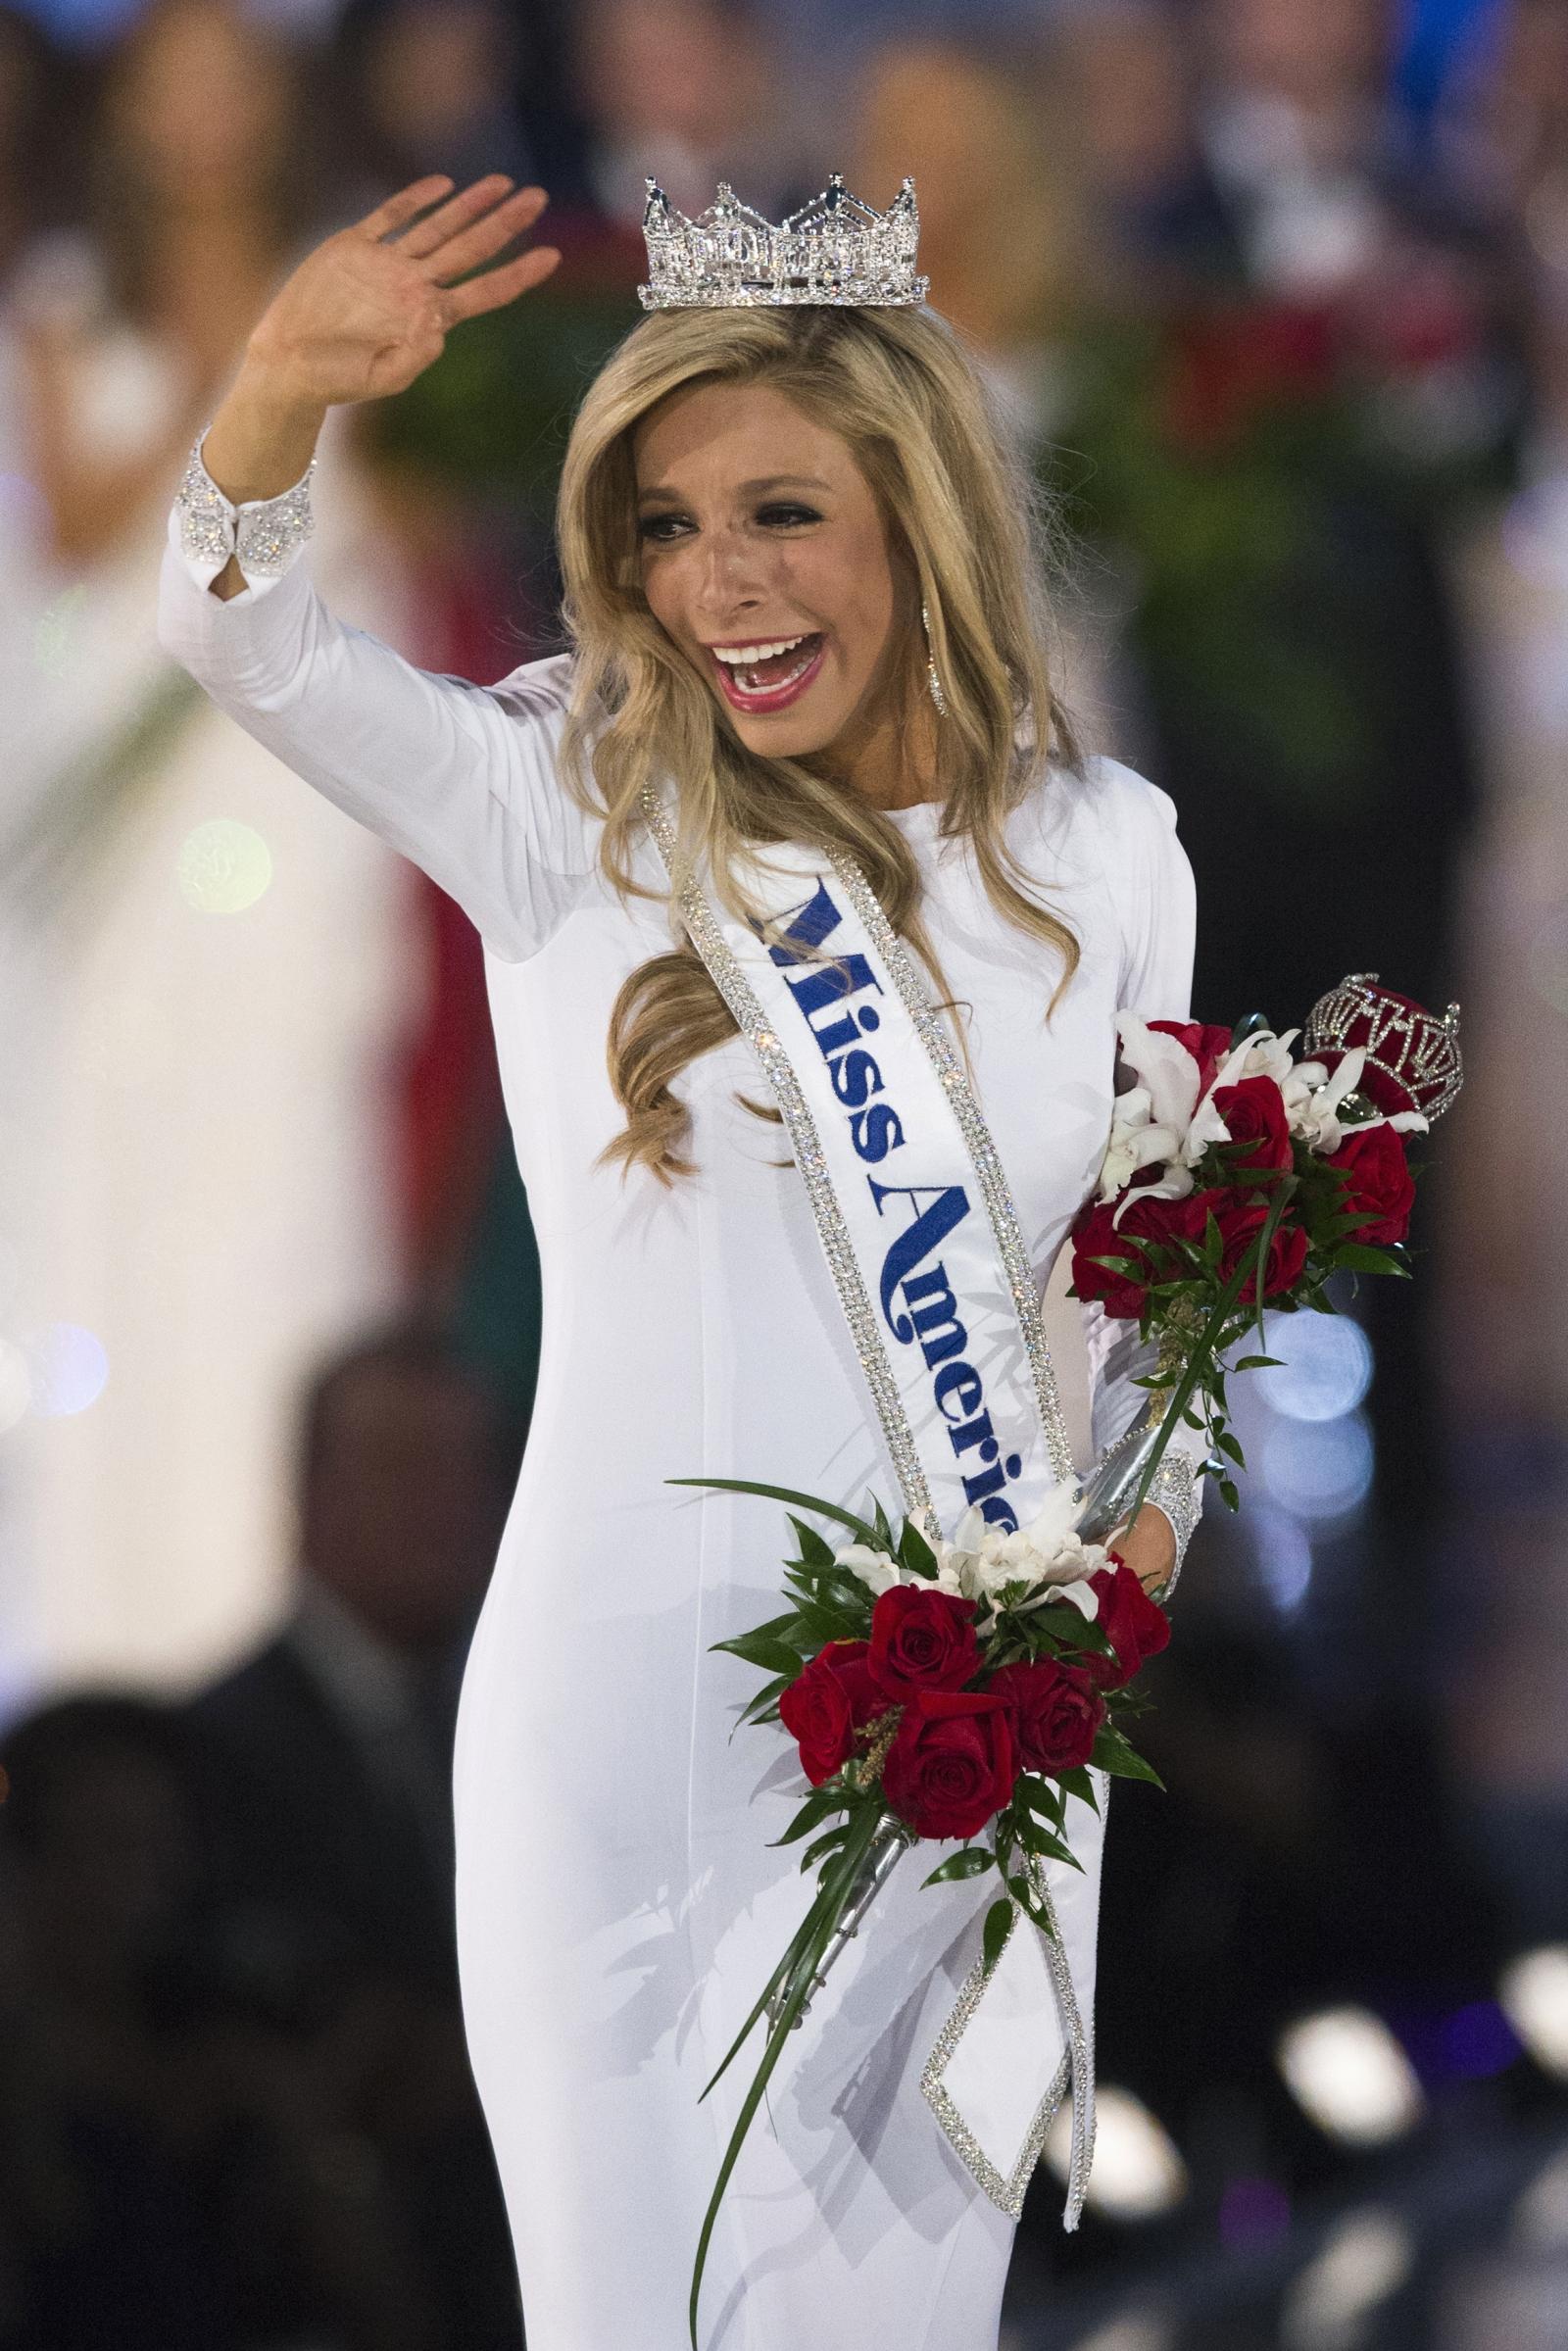 Miss New York Kira Kazantsev